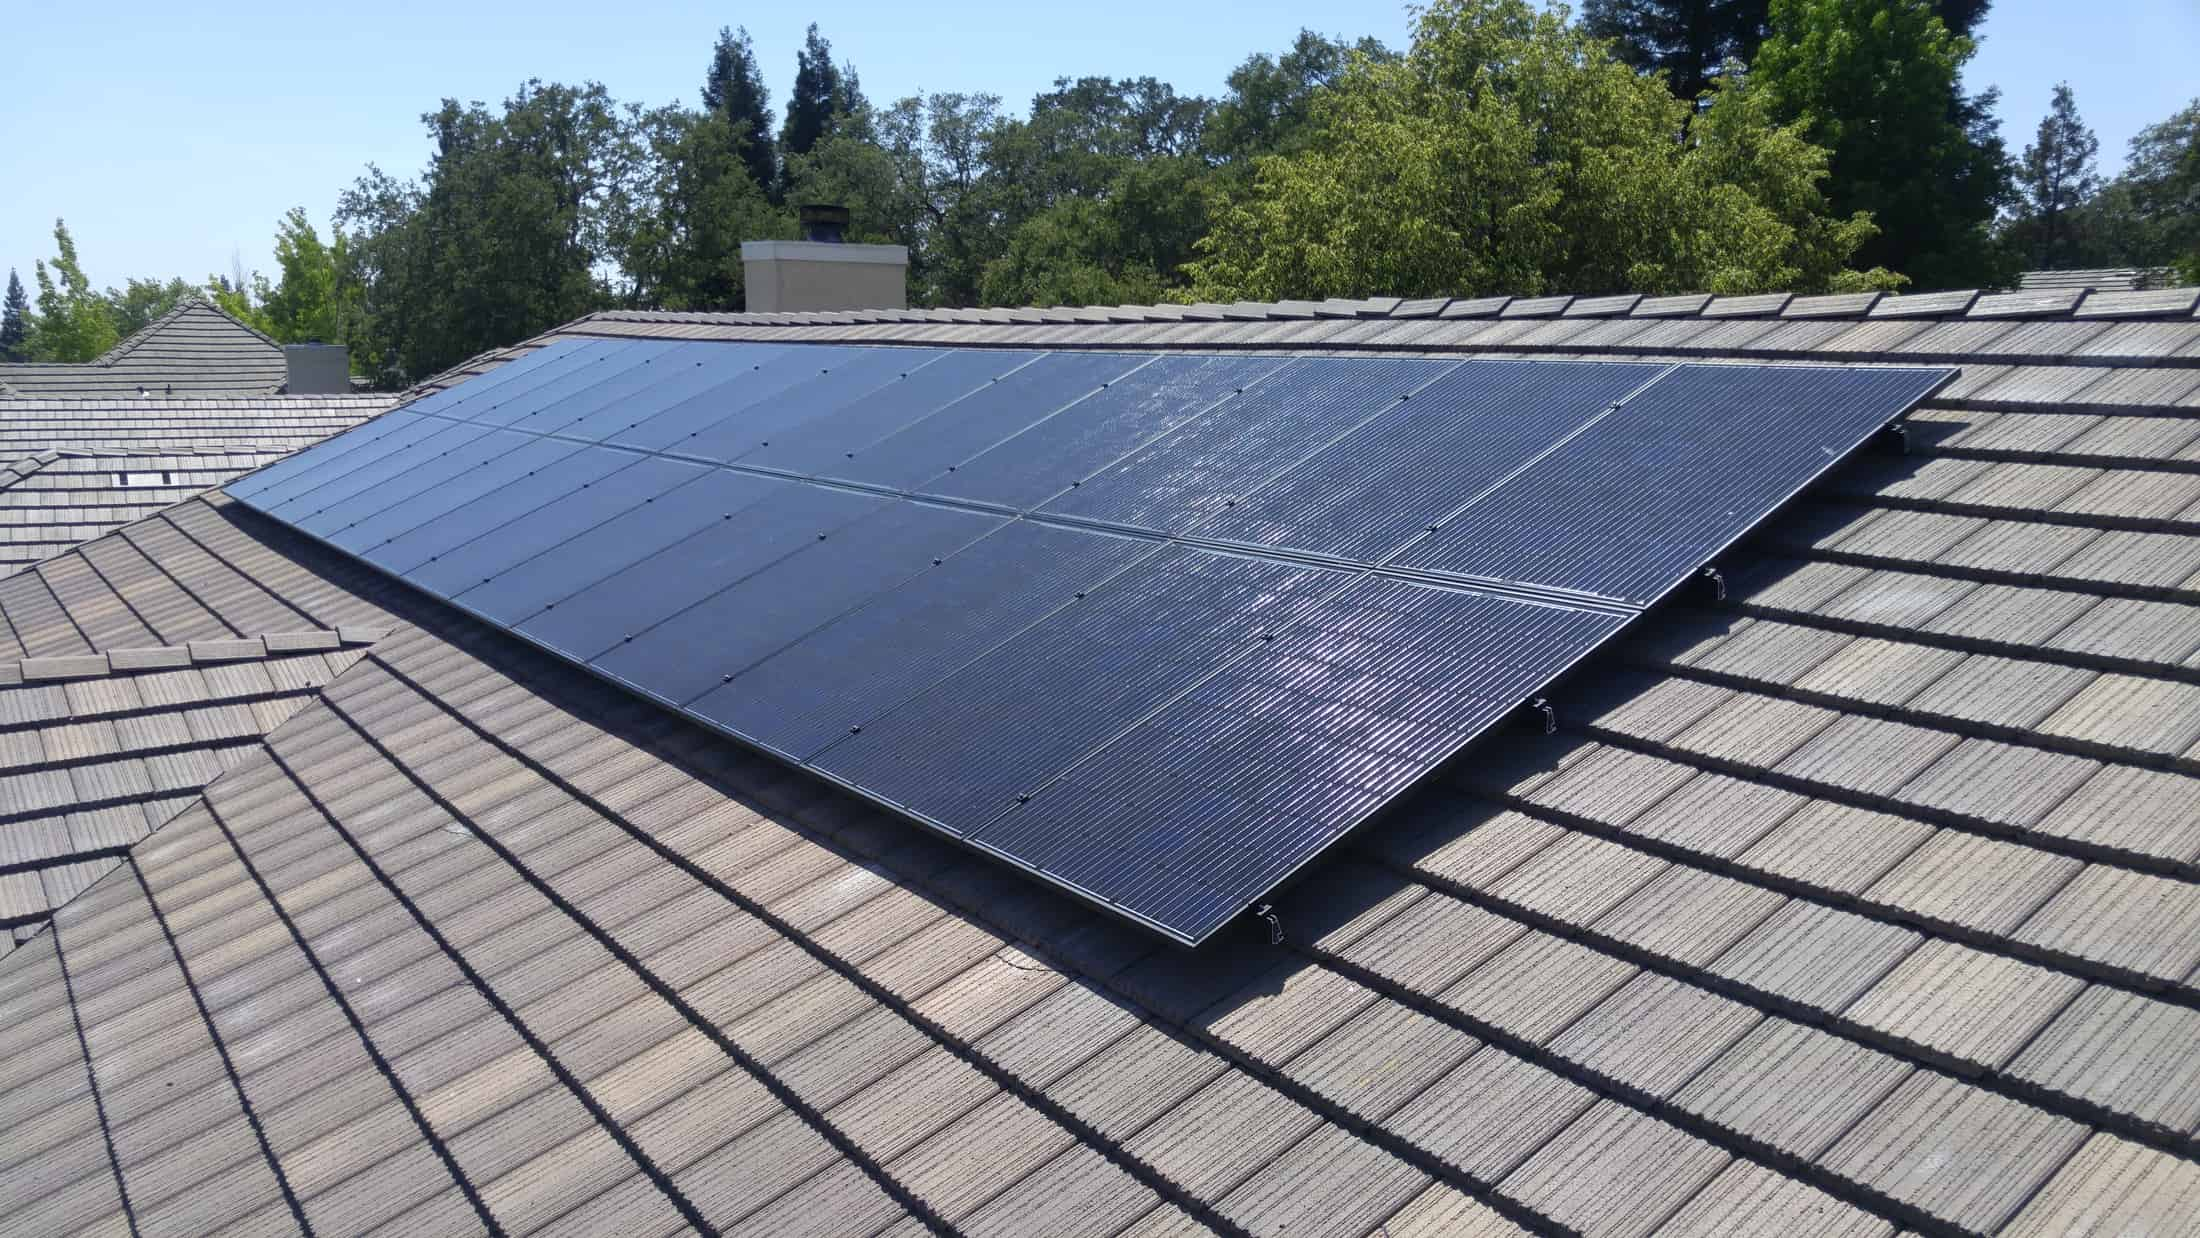 install on concrete tiles solar